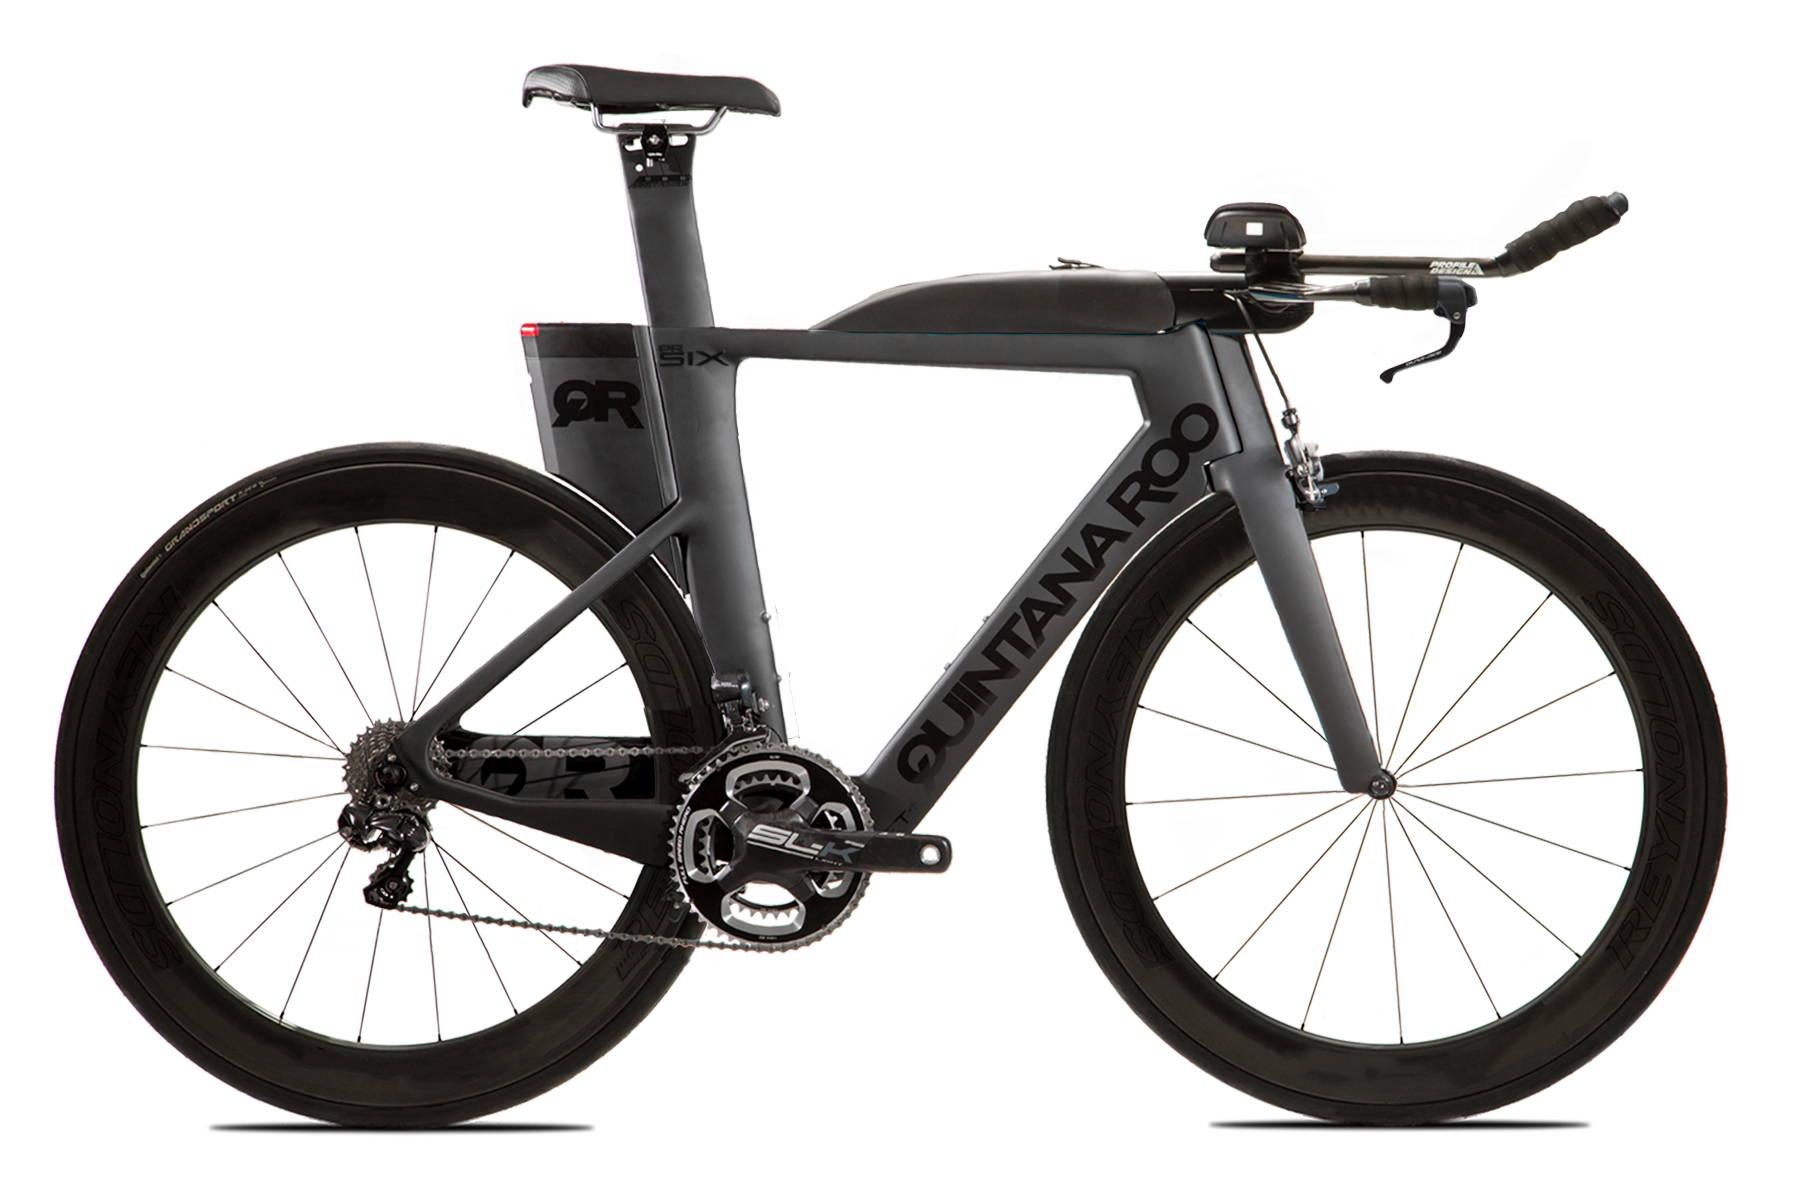 SRAM Vélo//Cycle//Vélo Gear Shifter Guidon ETAP Spots Set 150 mm